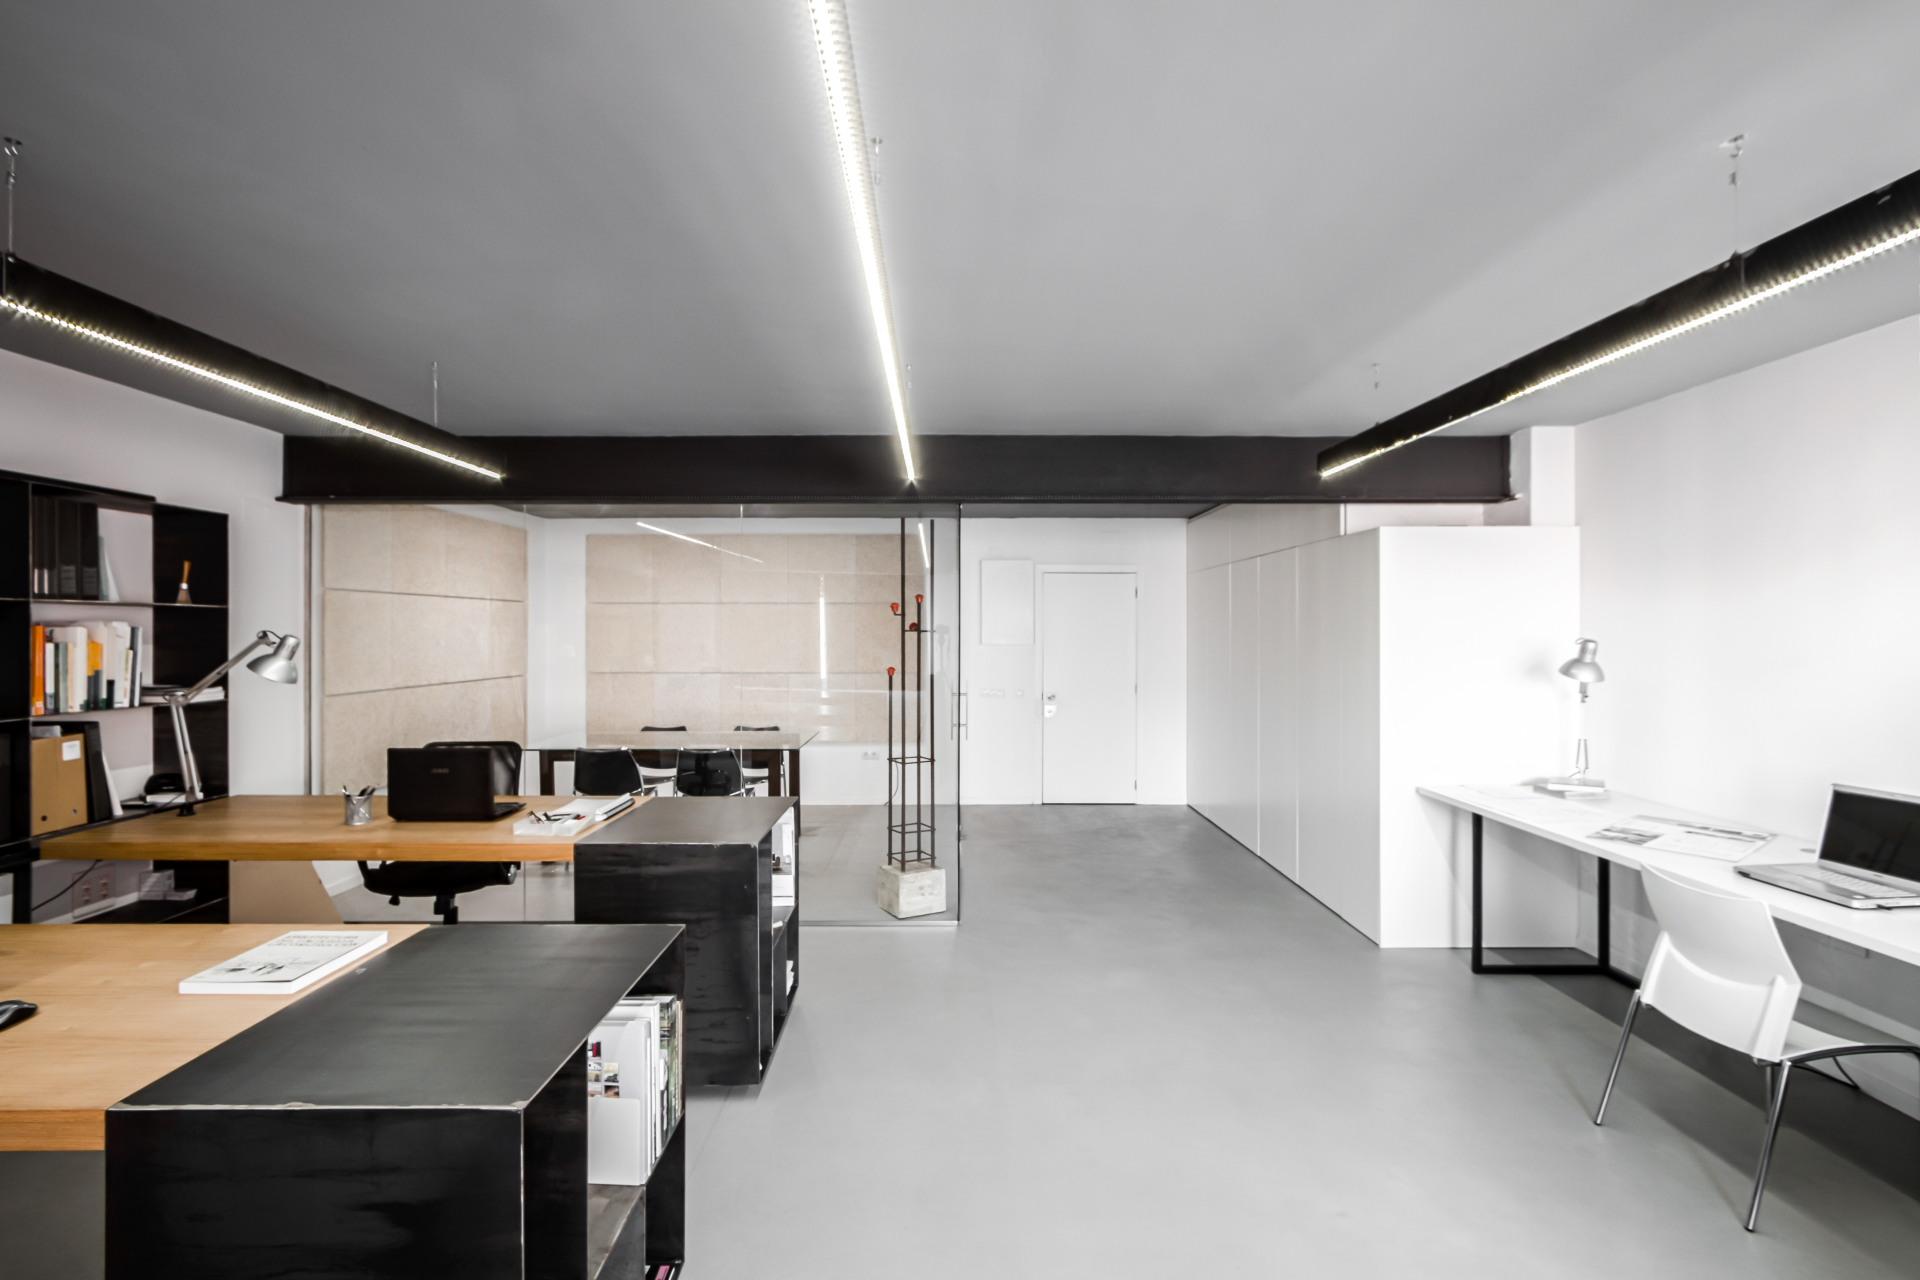 fotografia-arquitectura-valencia-german-cabo-viraje-estudio (5)